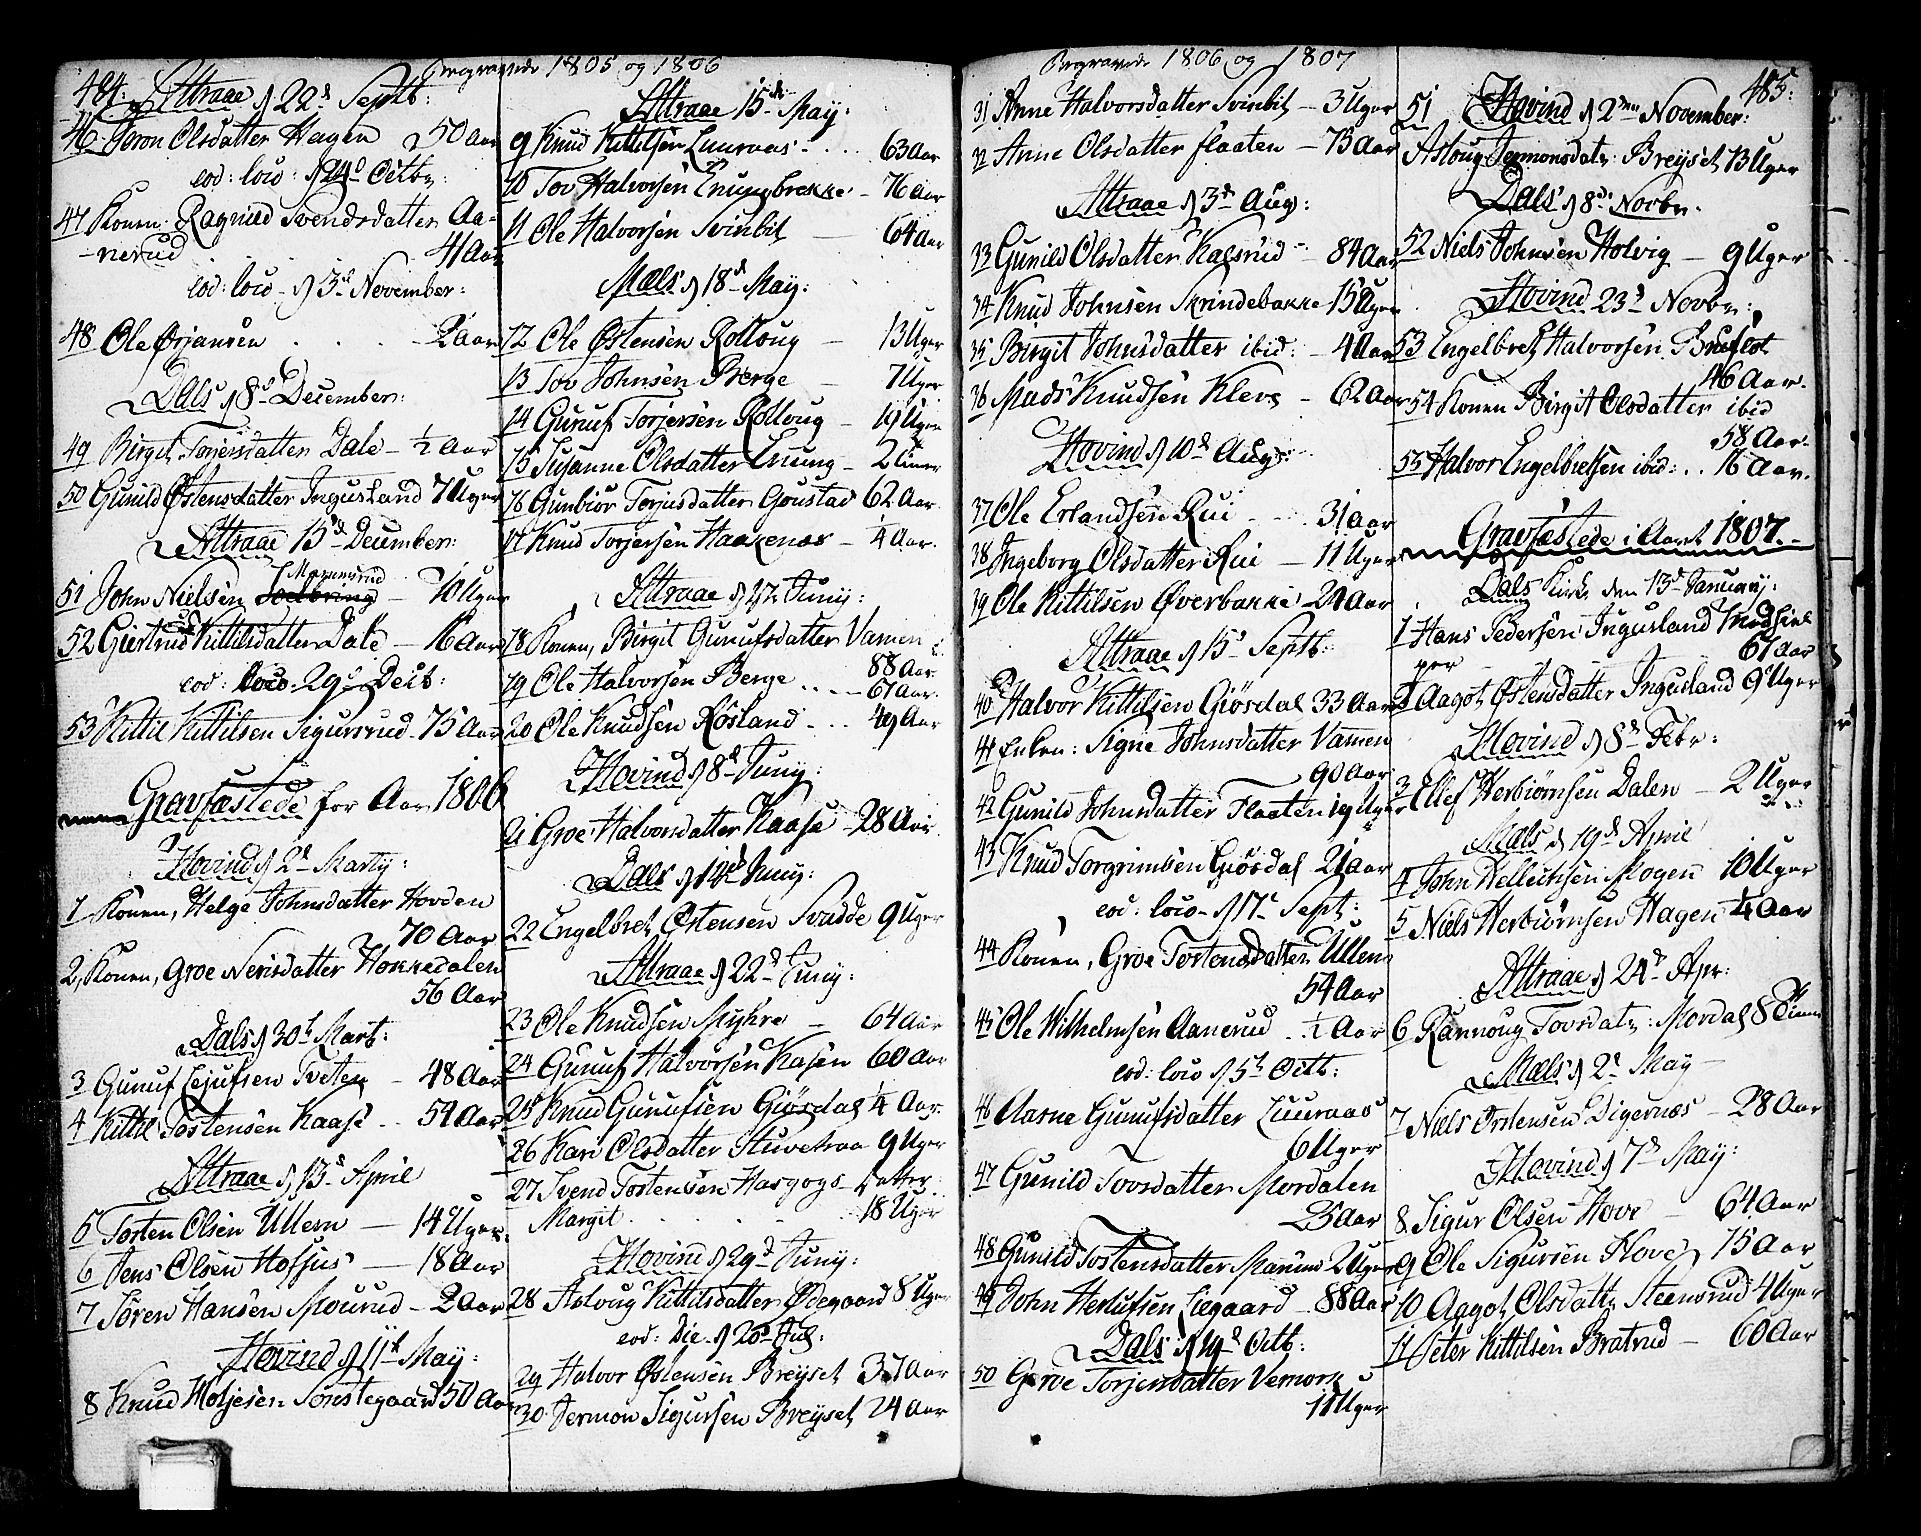 SAKO, Tinn kirkebøker, F/Fa/L0002: Ministerialbok nr. I 2, 1757-1810, s. 484-485